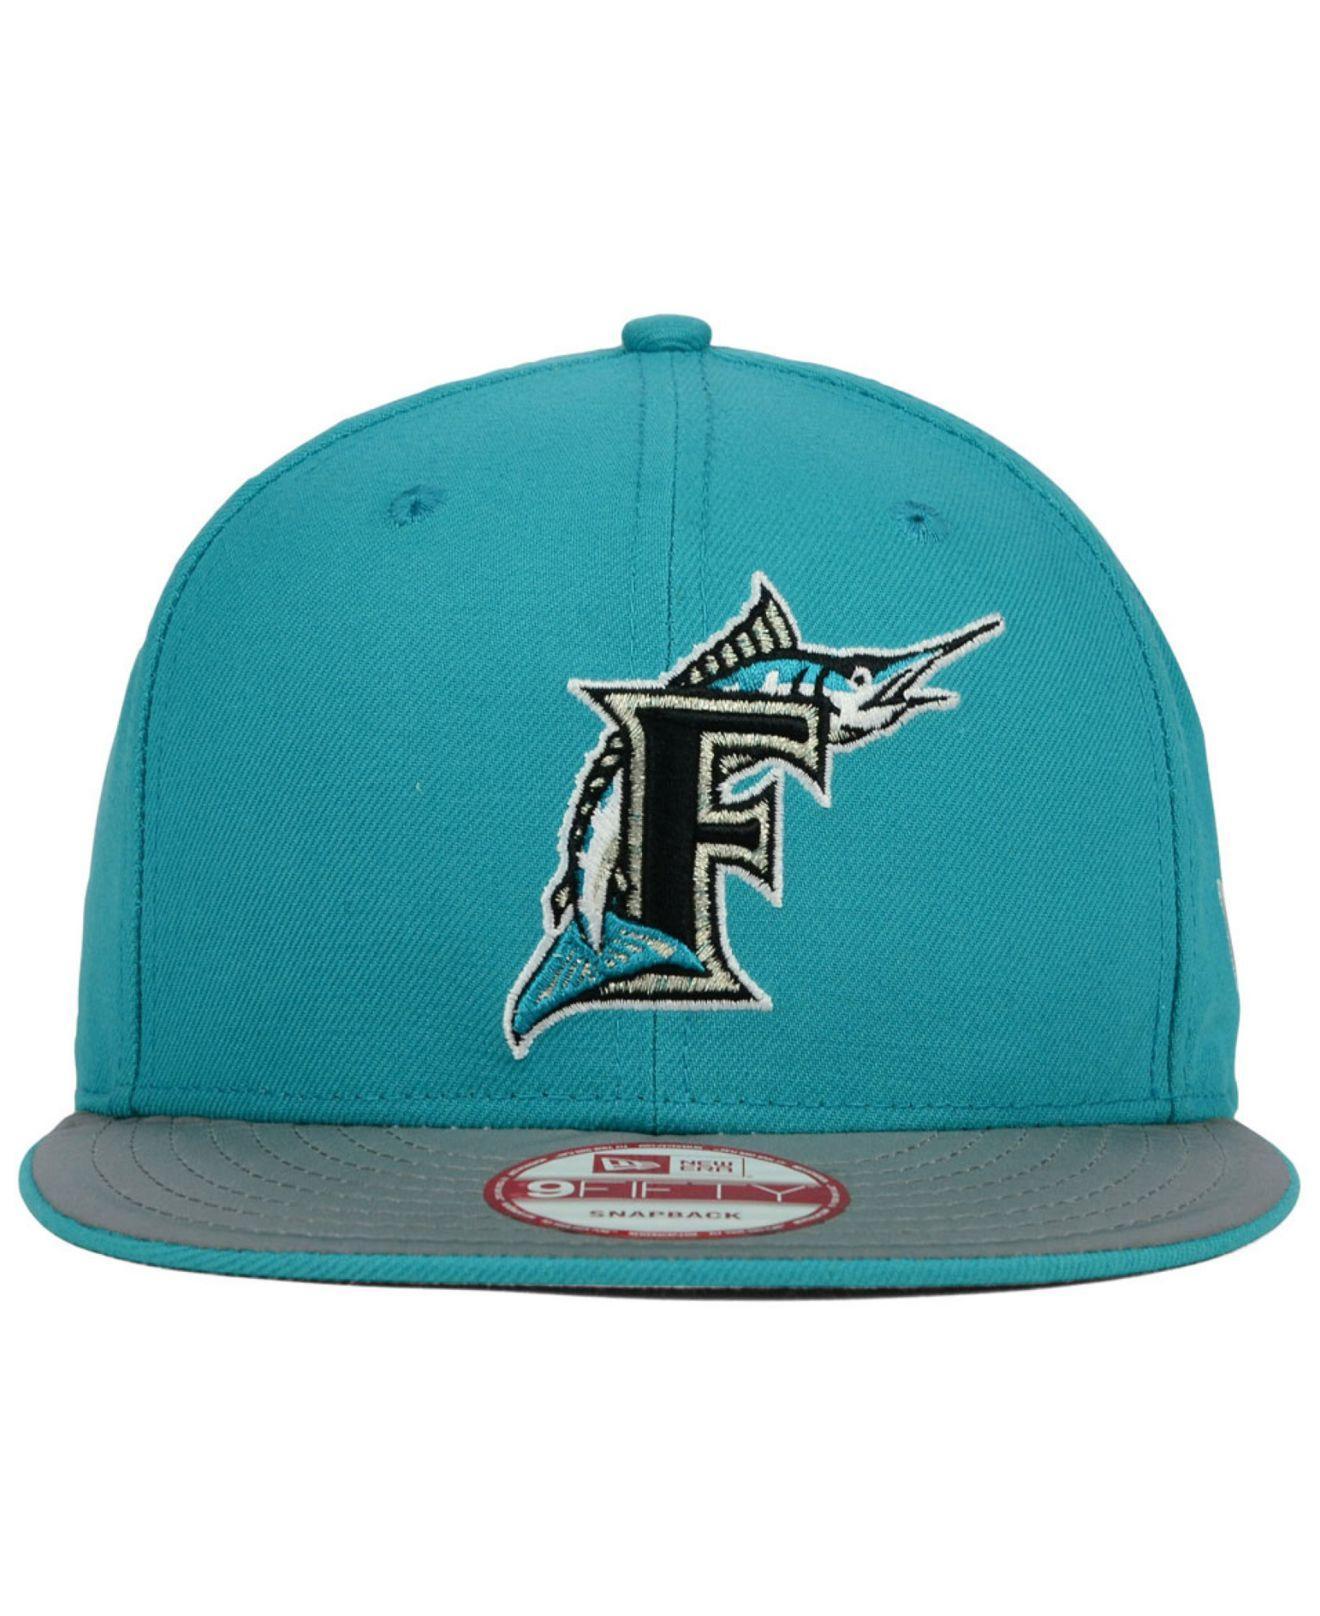 reputable site 932bb 43697 Lyst - KTZ Florida Marlins Team Reflect 9fifty Snapback Cap in Blue ...